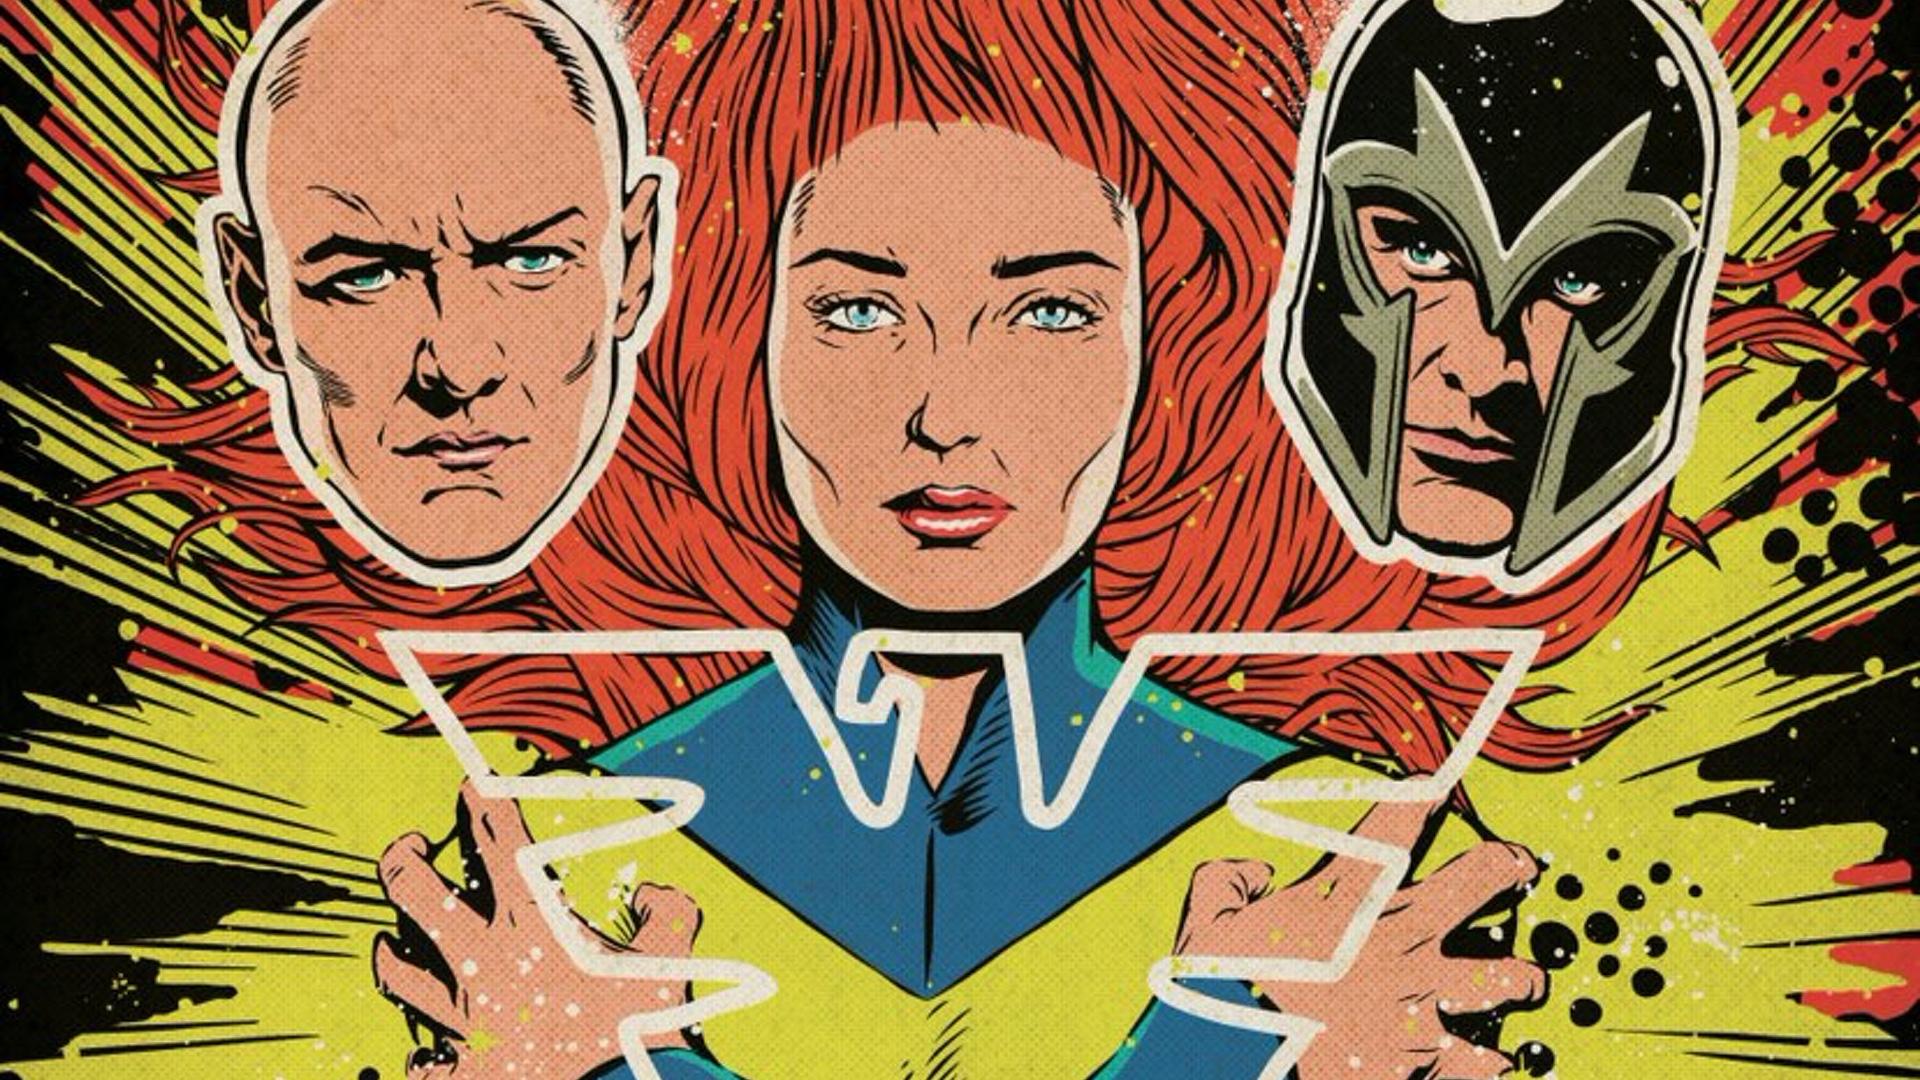 X Men Dark Phoenix Gets Official Comic Book Style Poster Art